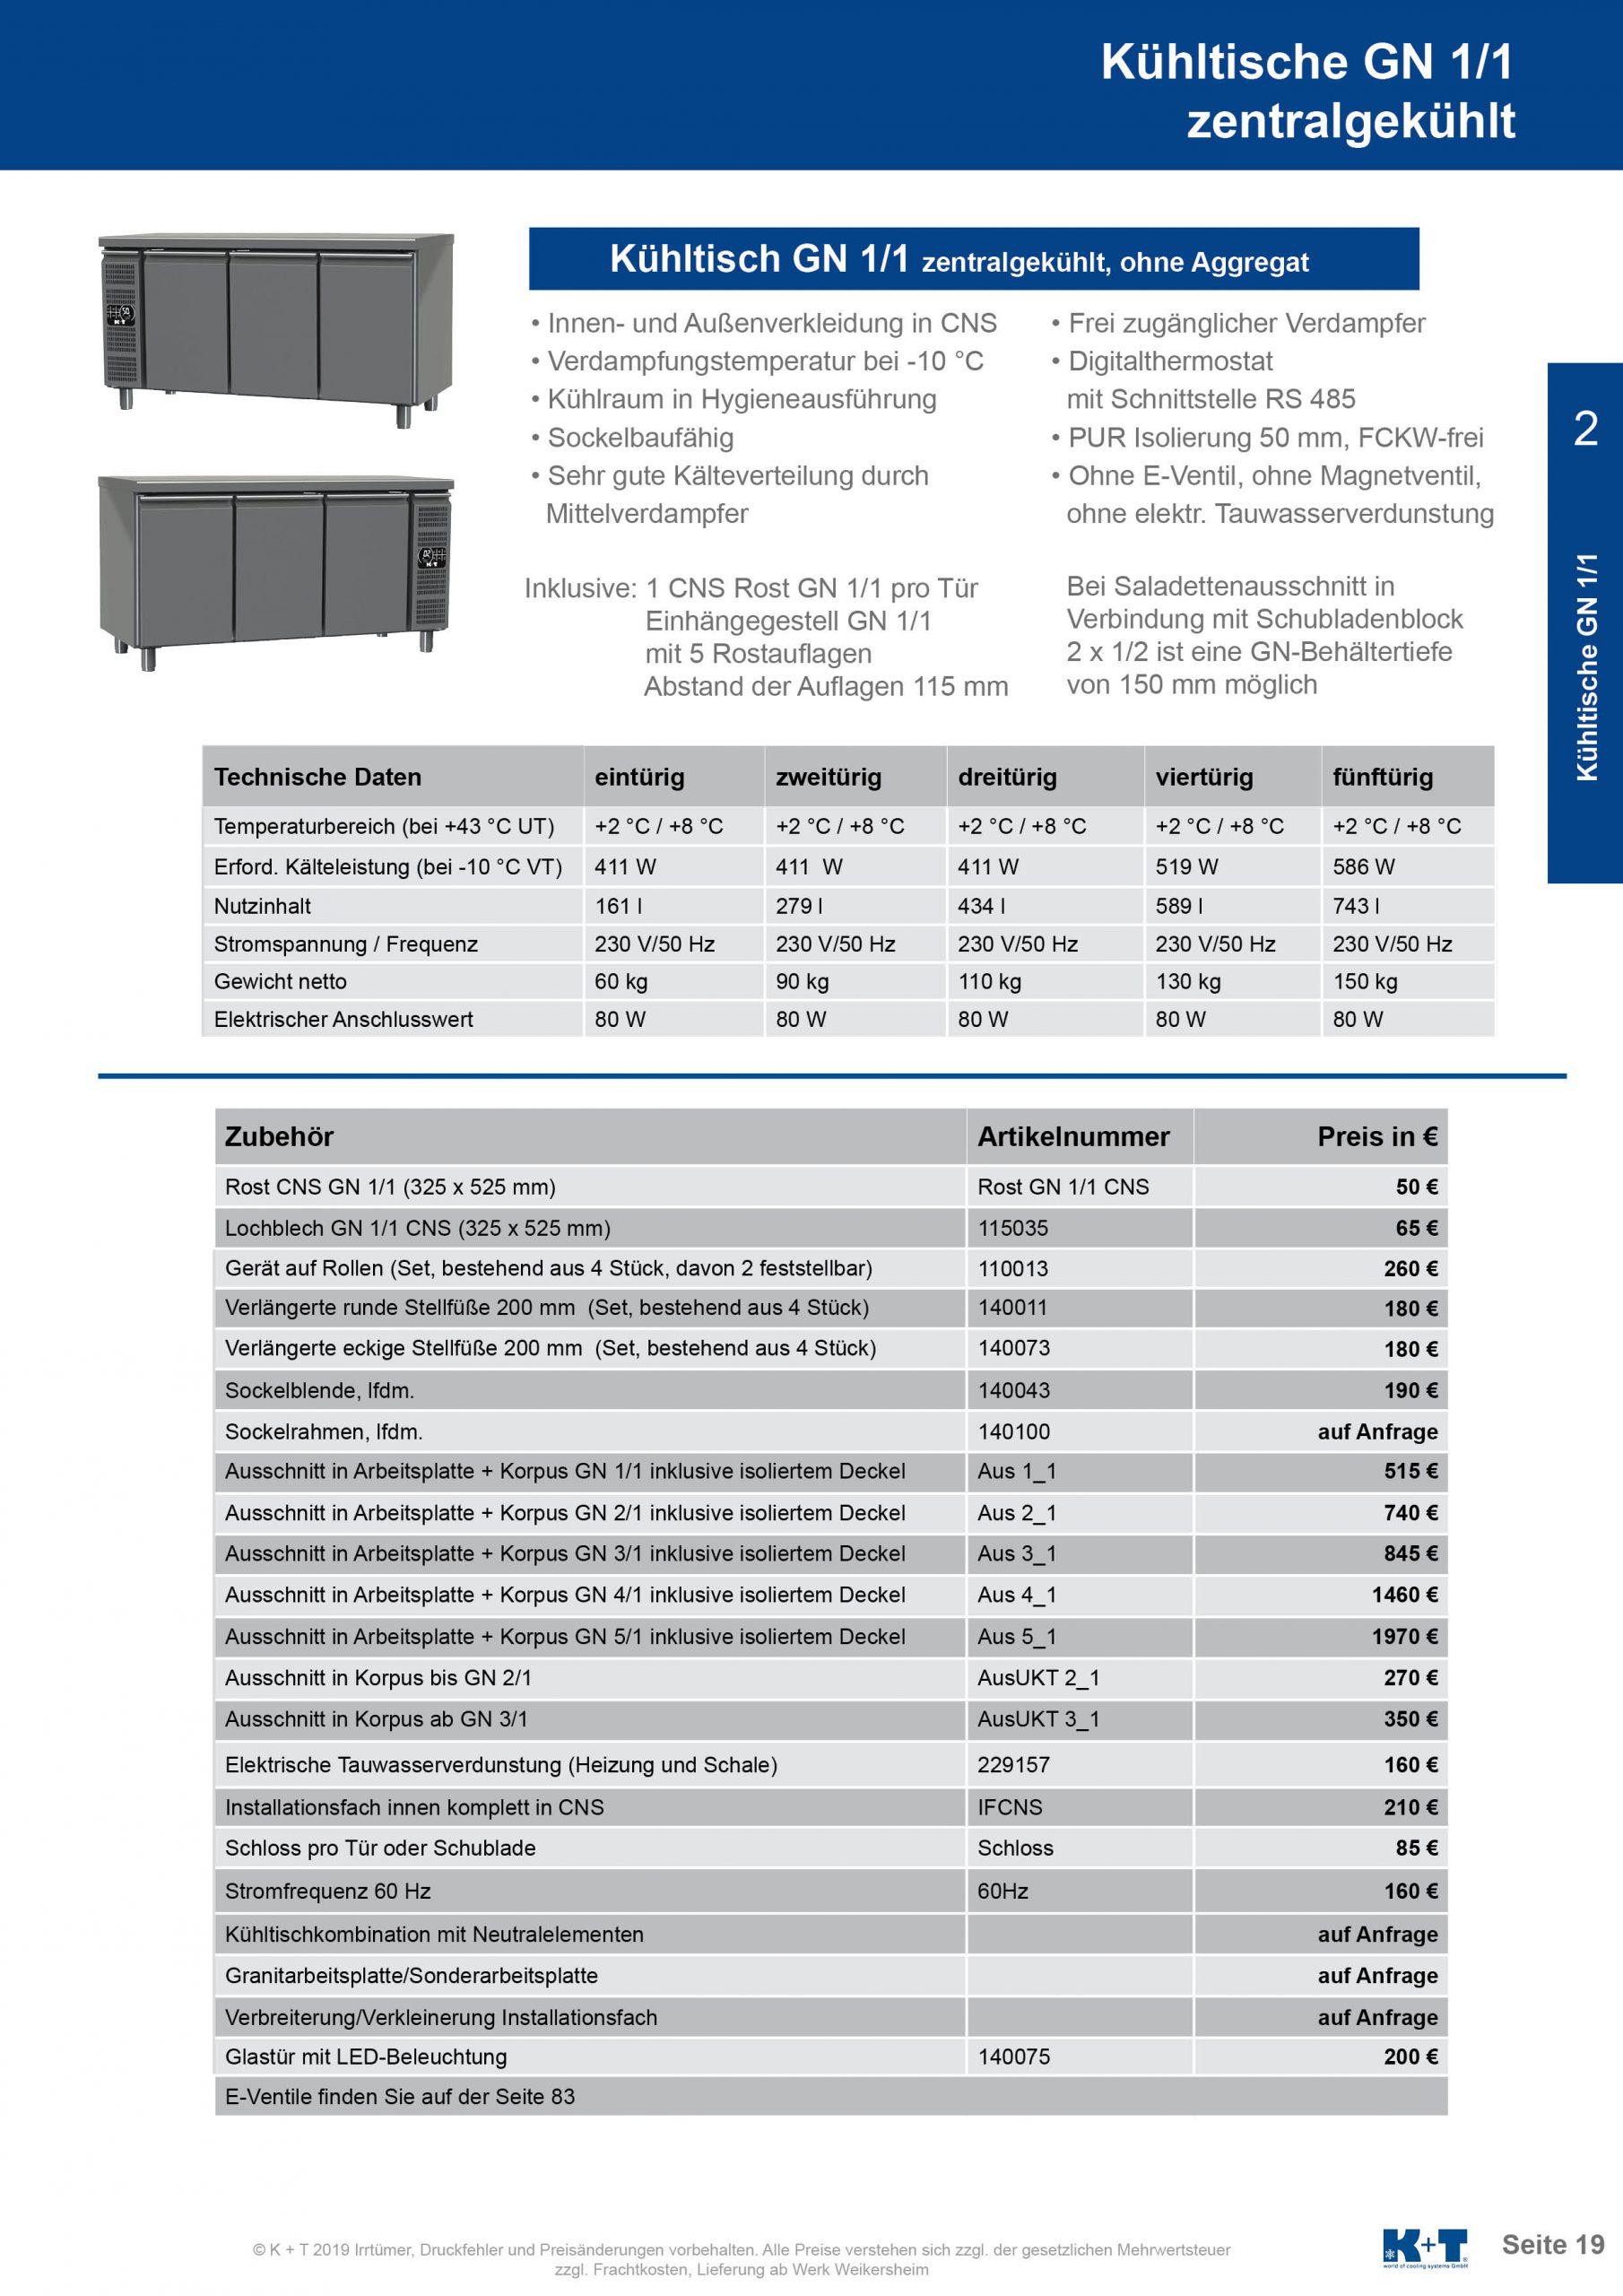 Kühltisch GN 1_1 Korpus 700 zentralegekühlt 2